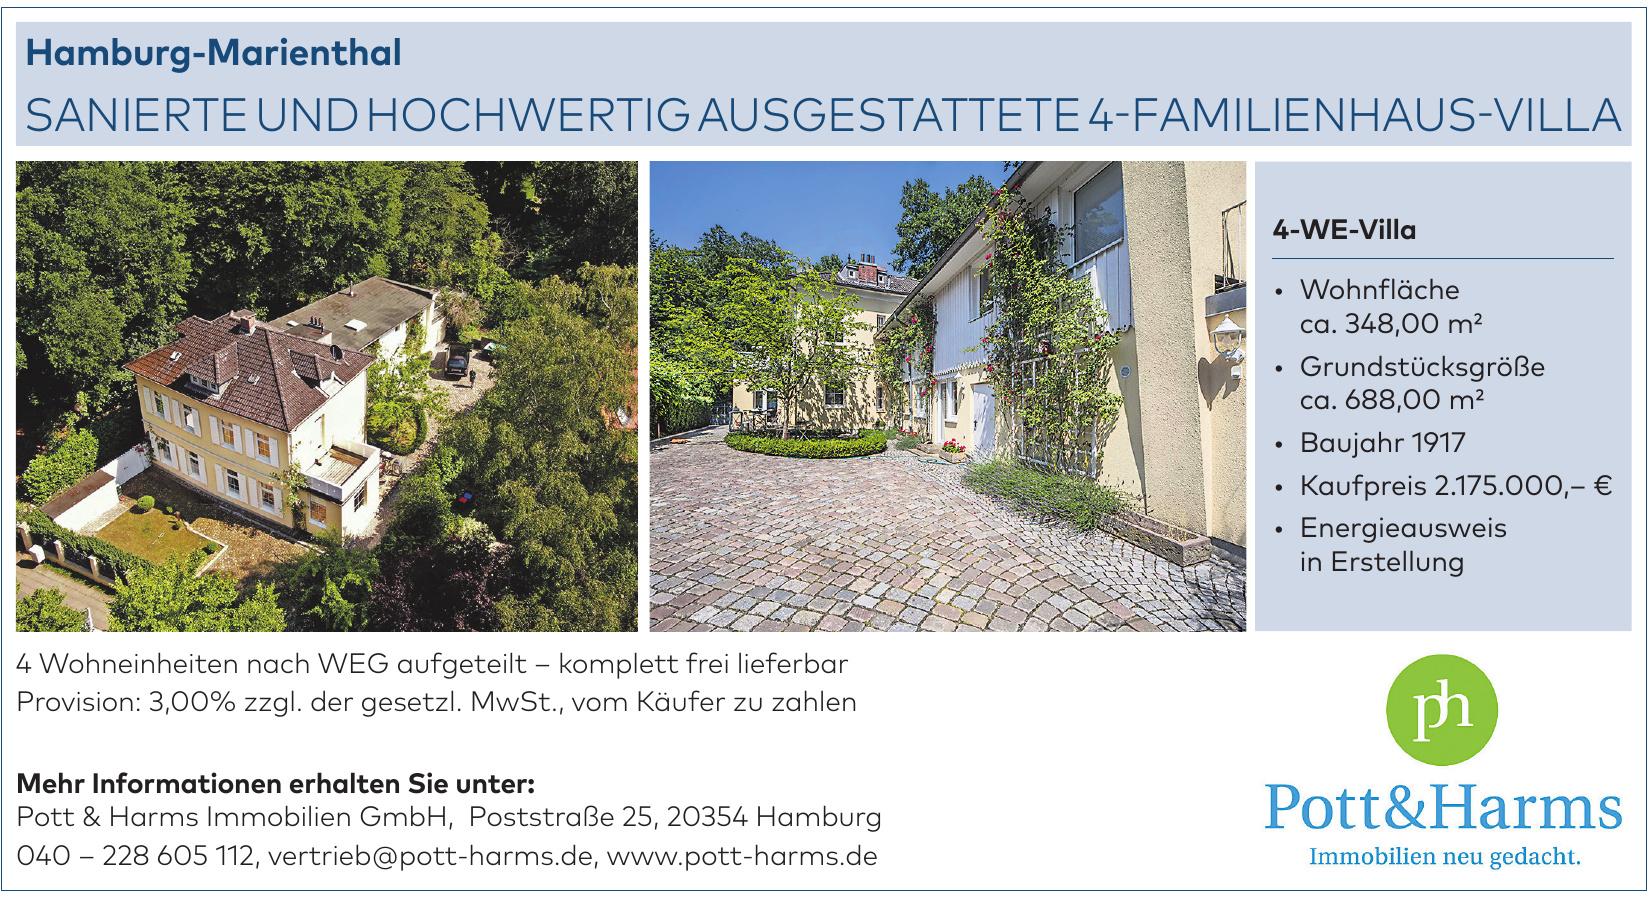 Pott & Harms Immobilien GmbH